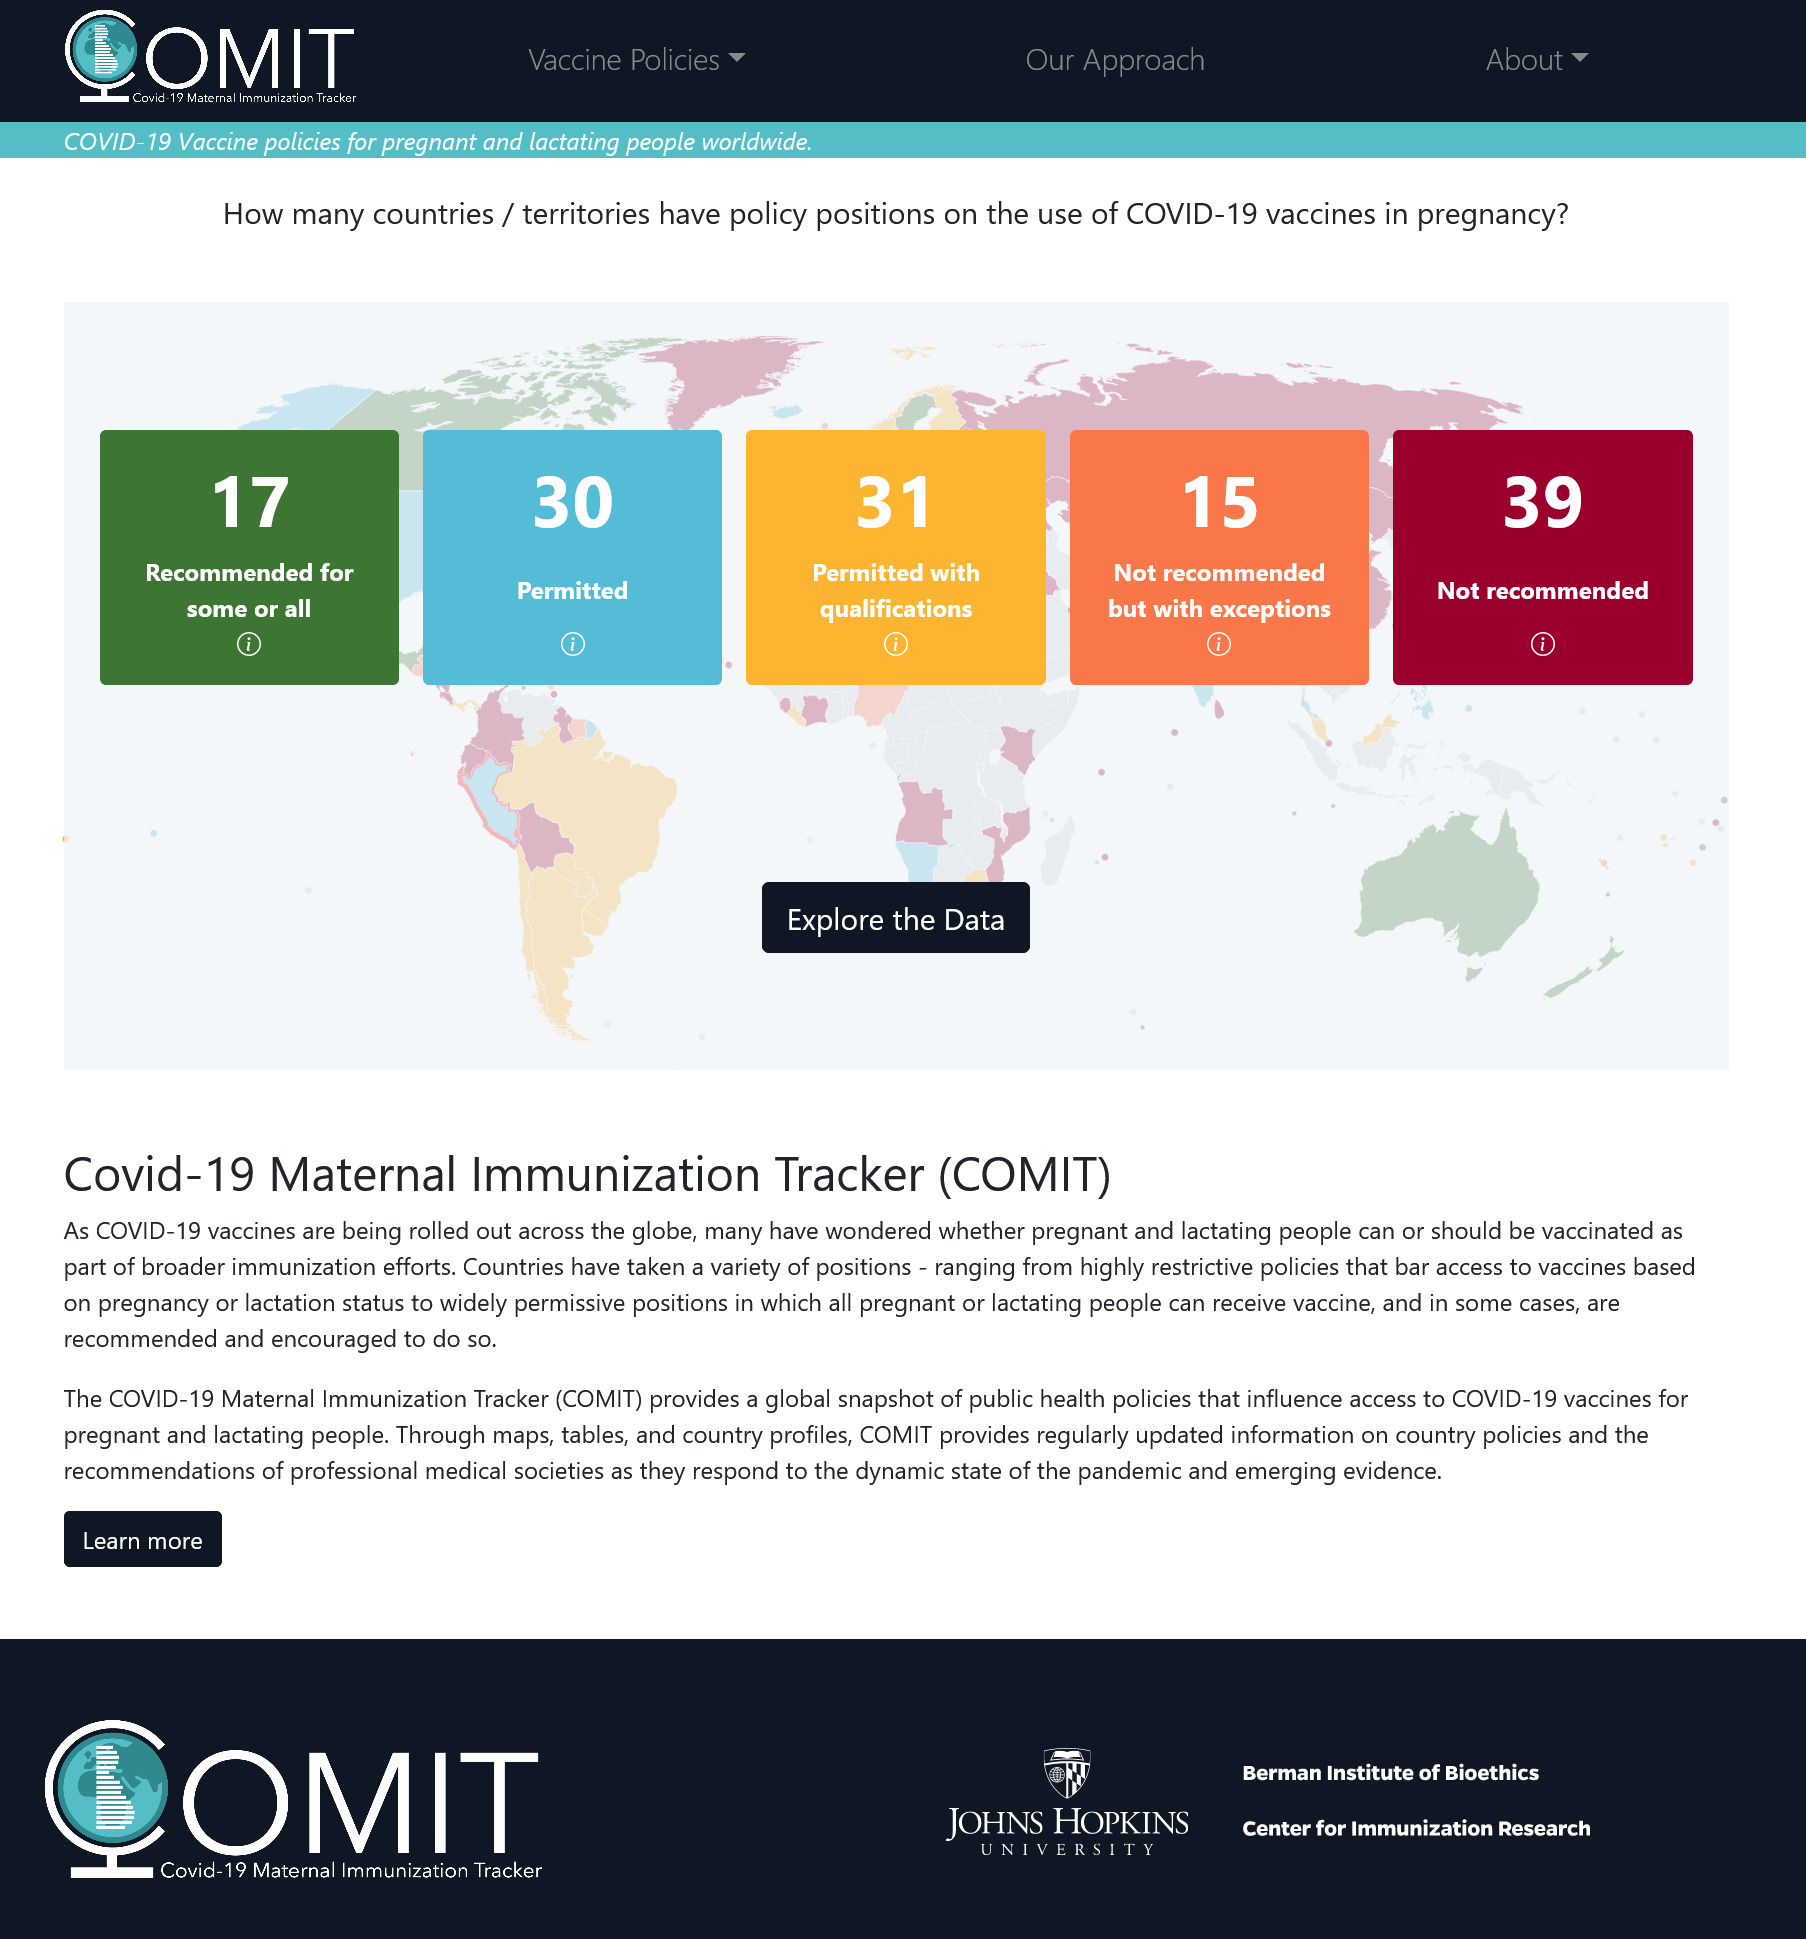 Covid-19 Maternal Immunization Tracker